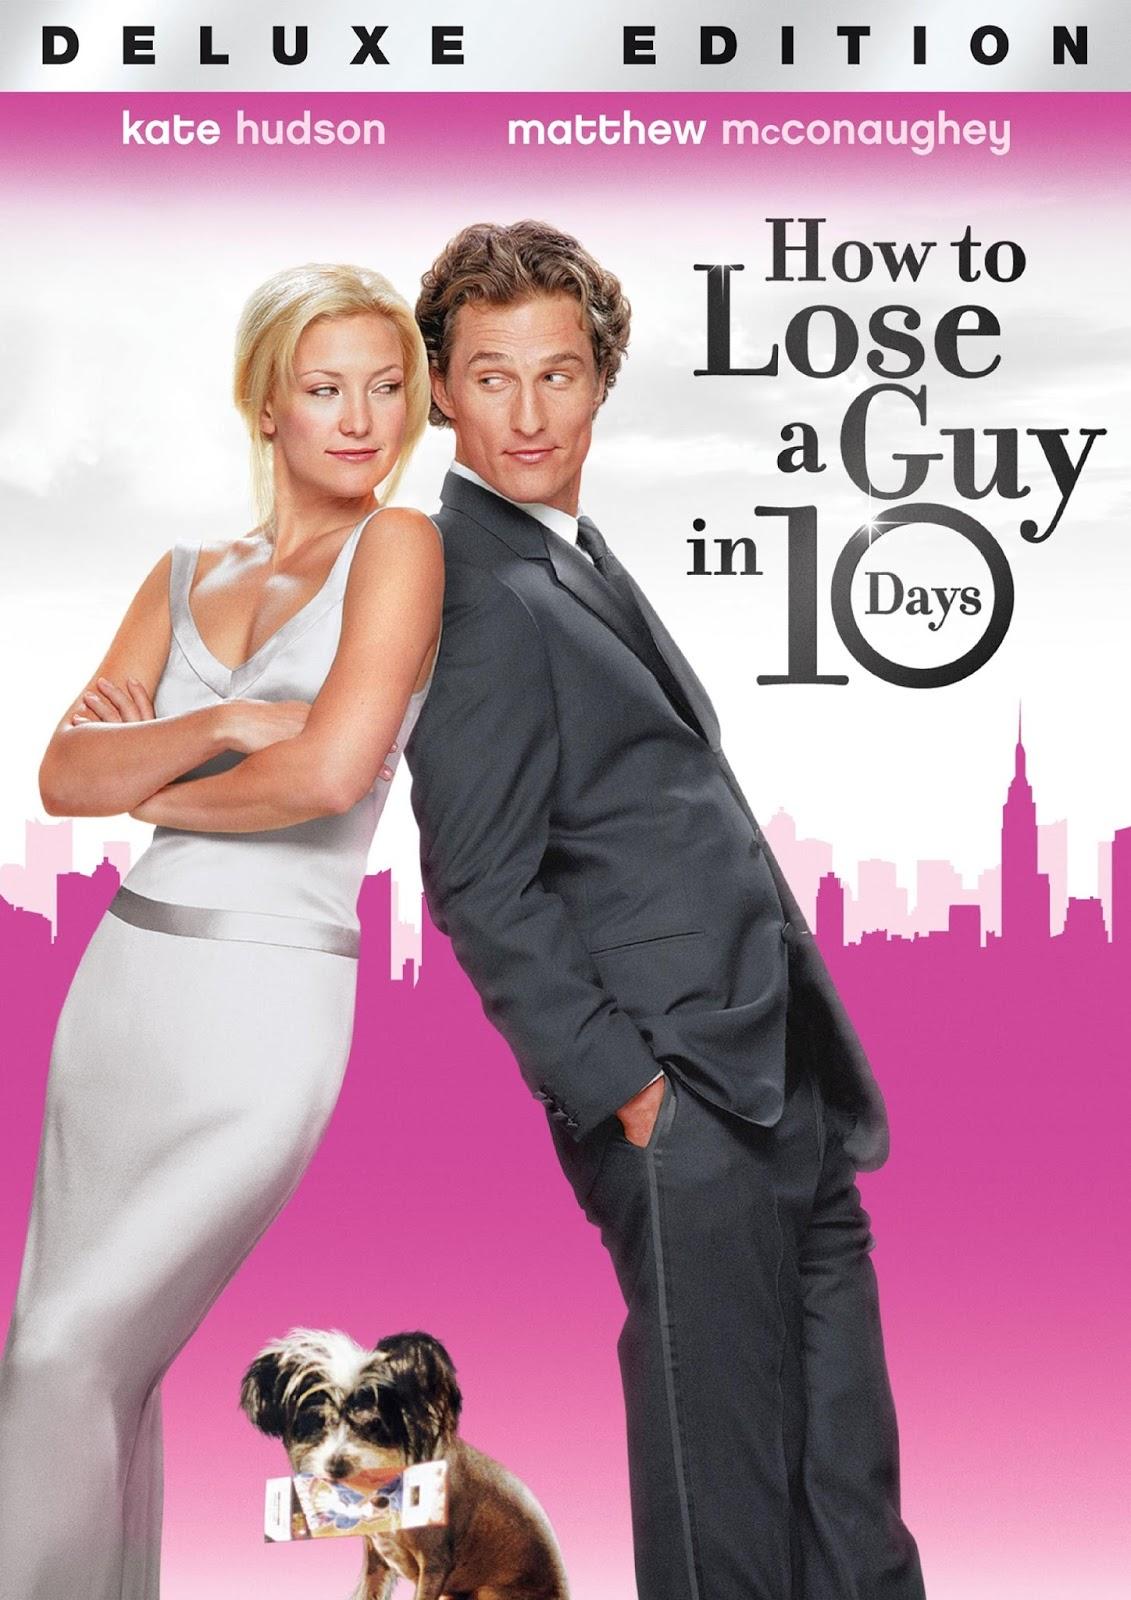 How to Lose A Guy In 10 Days แผนรักฉบับซิ่ง ชิ่งให้ได้ใน 10 วัน [HD][พากย์ไทย]